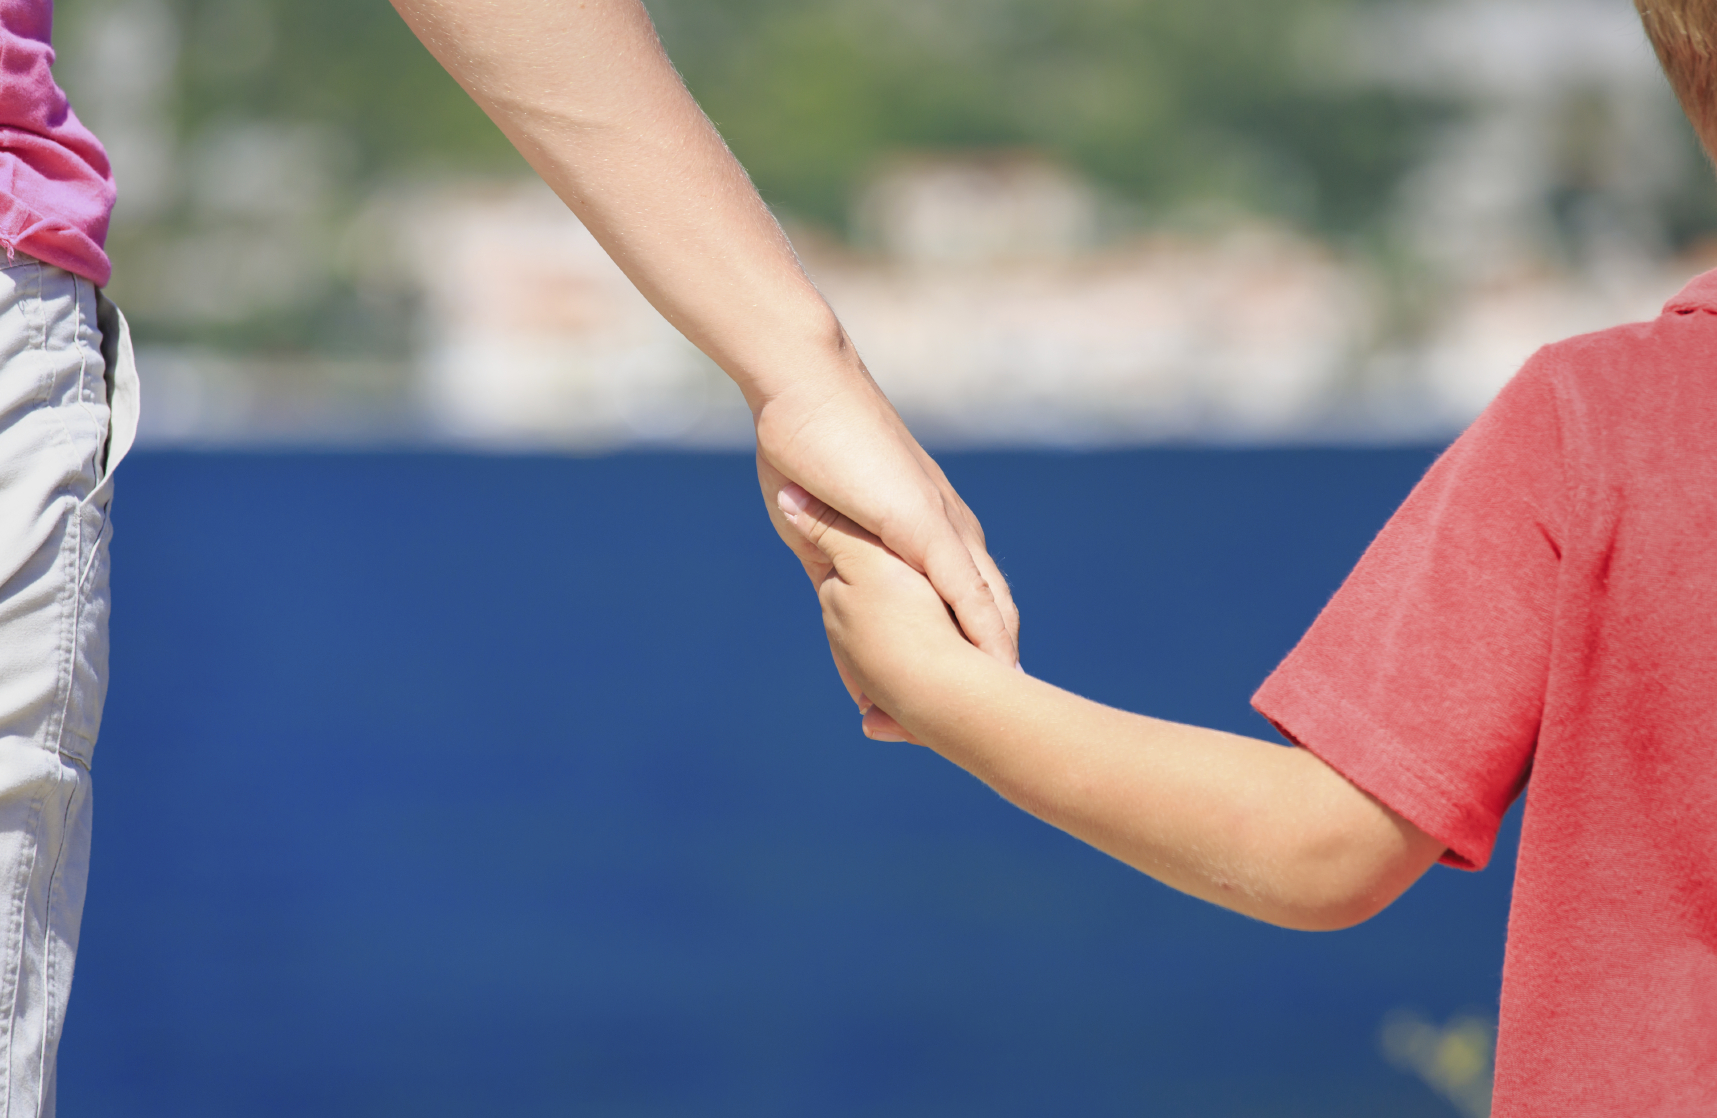 Child Support in Colorado  DivorceNet